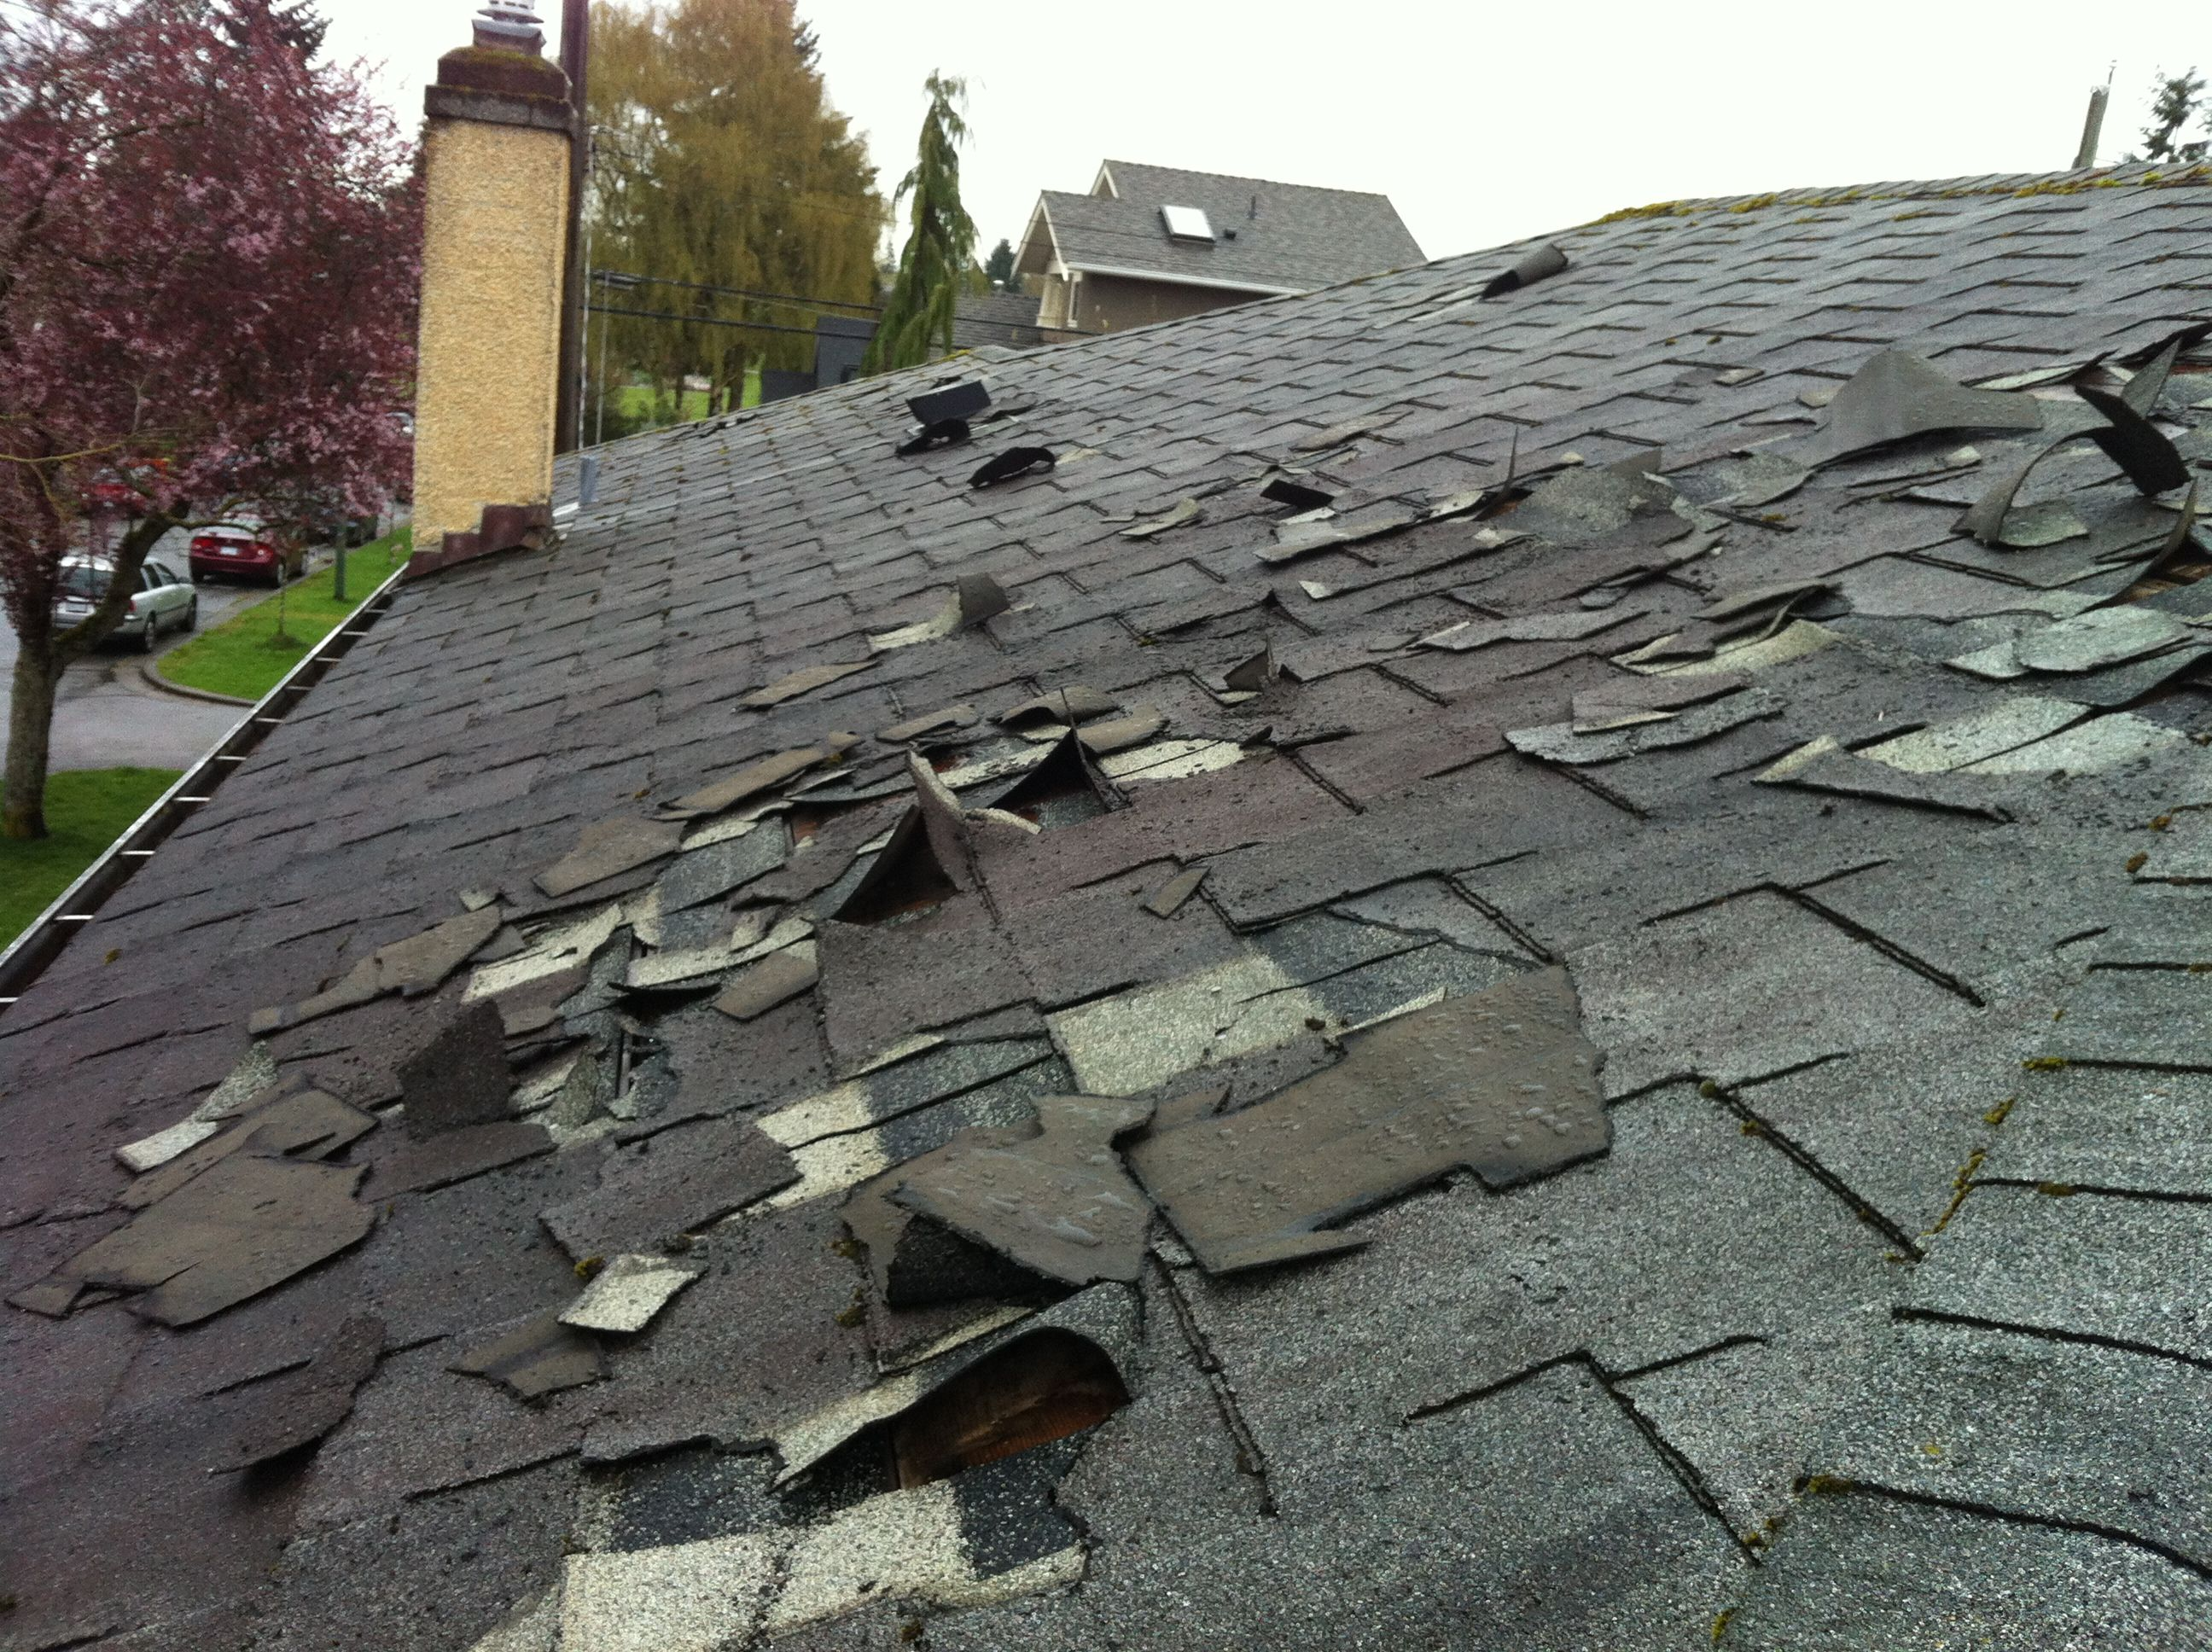 Voted Best Savannah Hail Wind Roof Damage Storm Roof Damage In Savannah Georgia Roof Damage Roof Restoration Roof Inspection